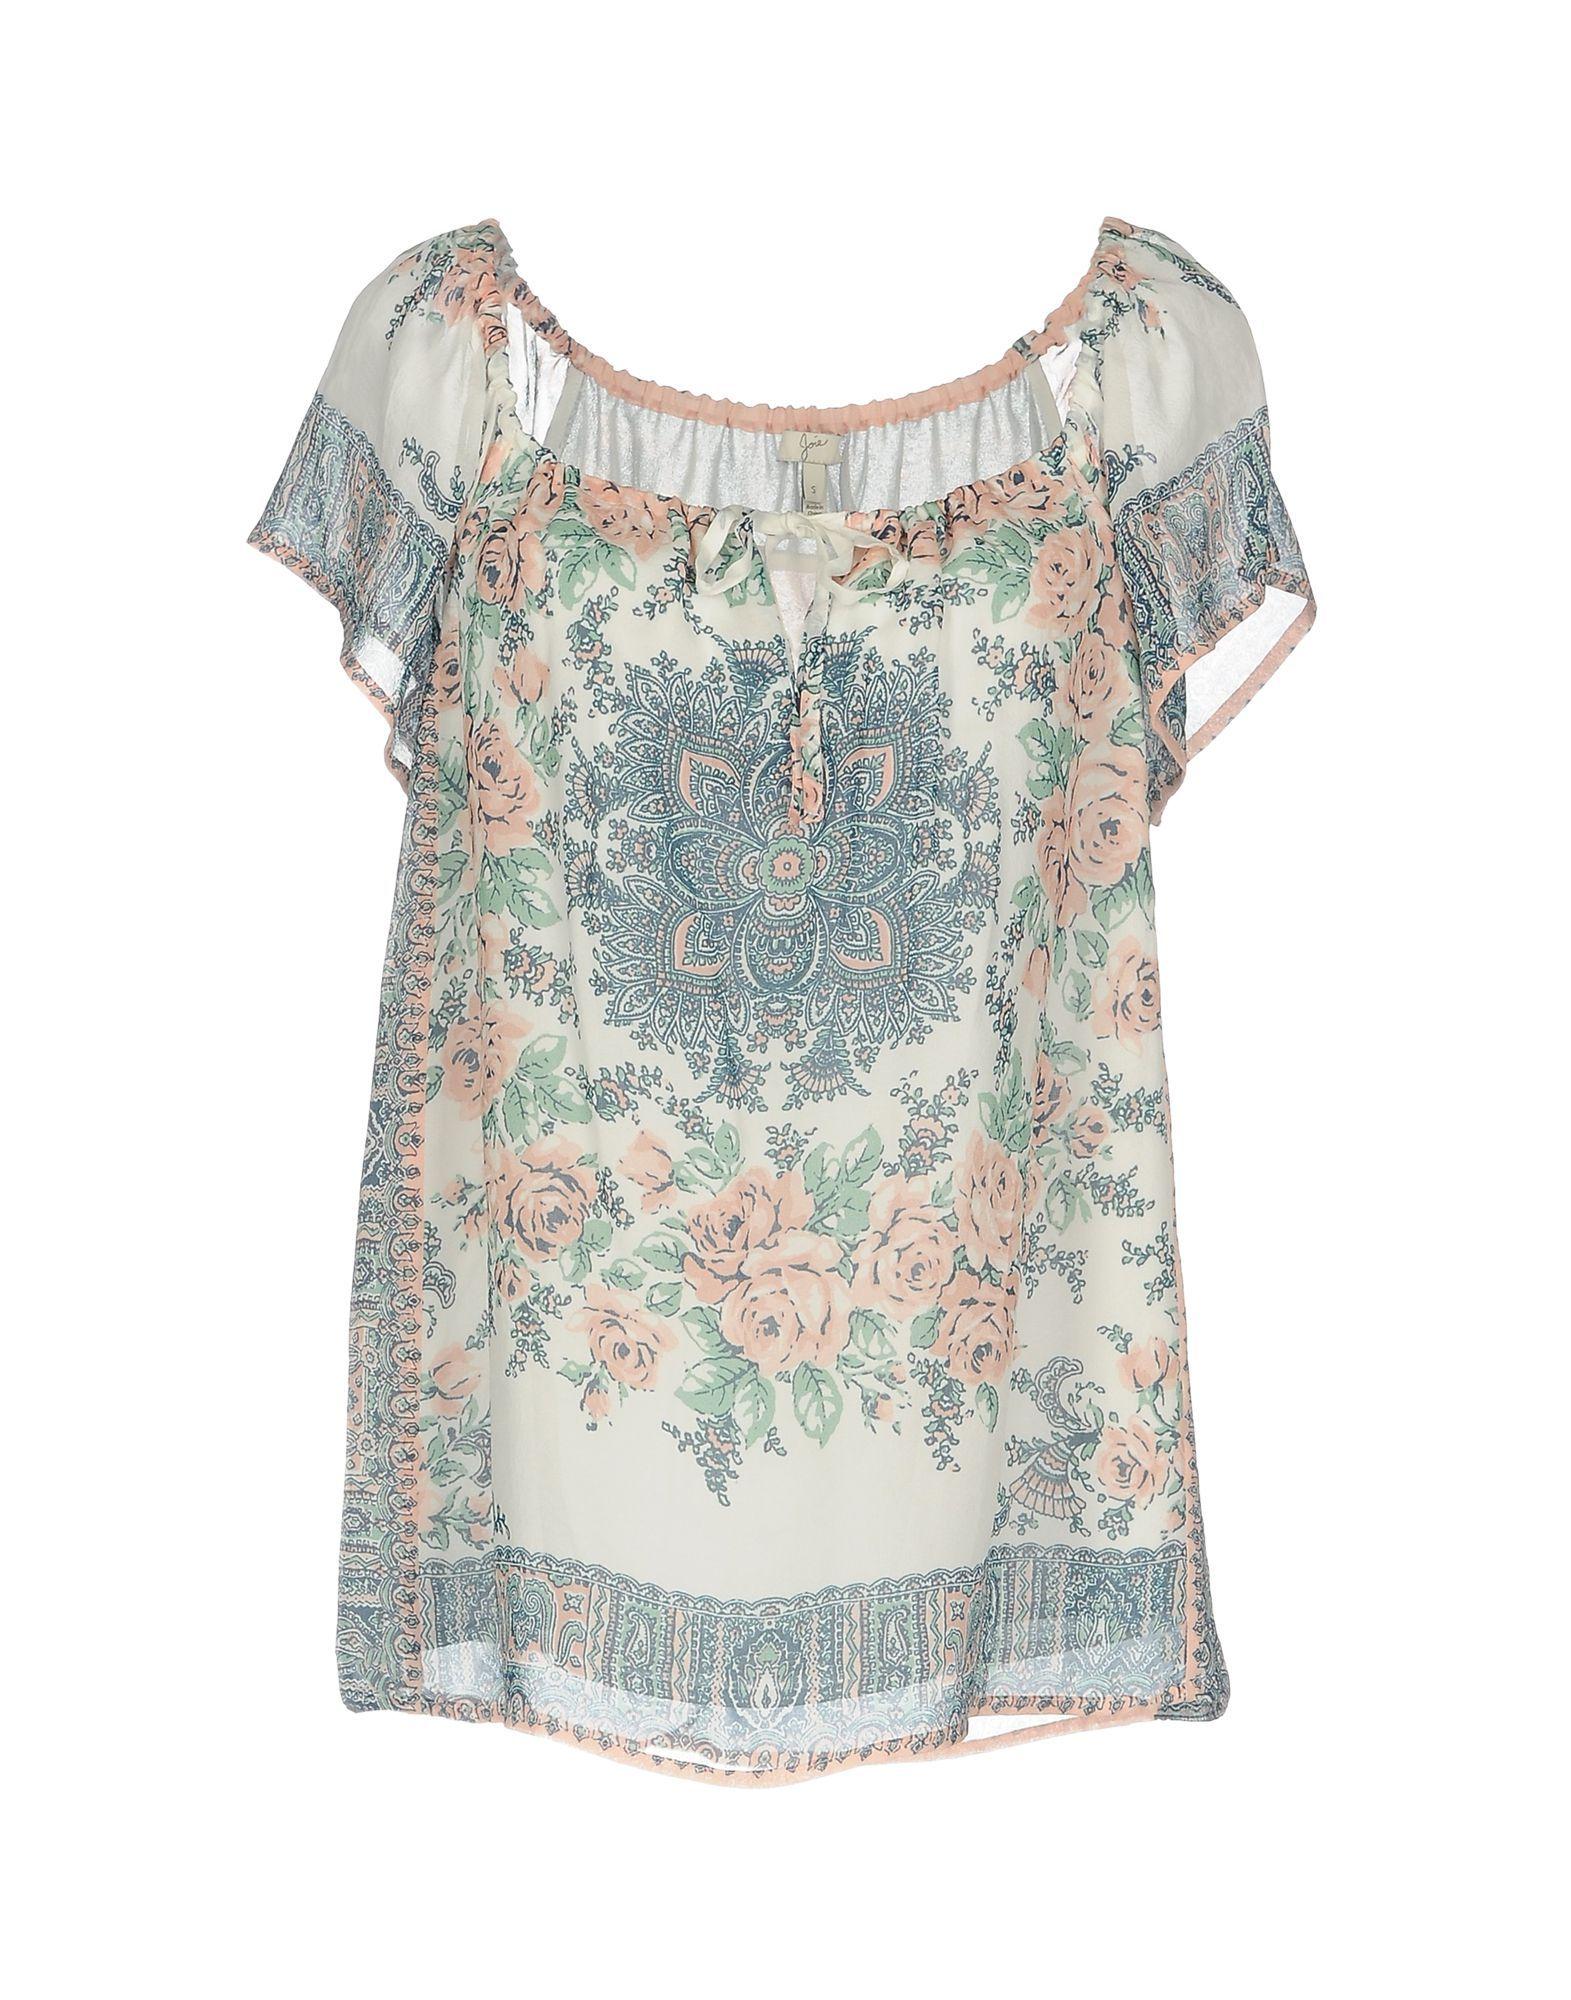 Joie Ivory Floral Design Blouse